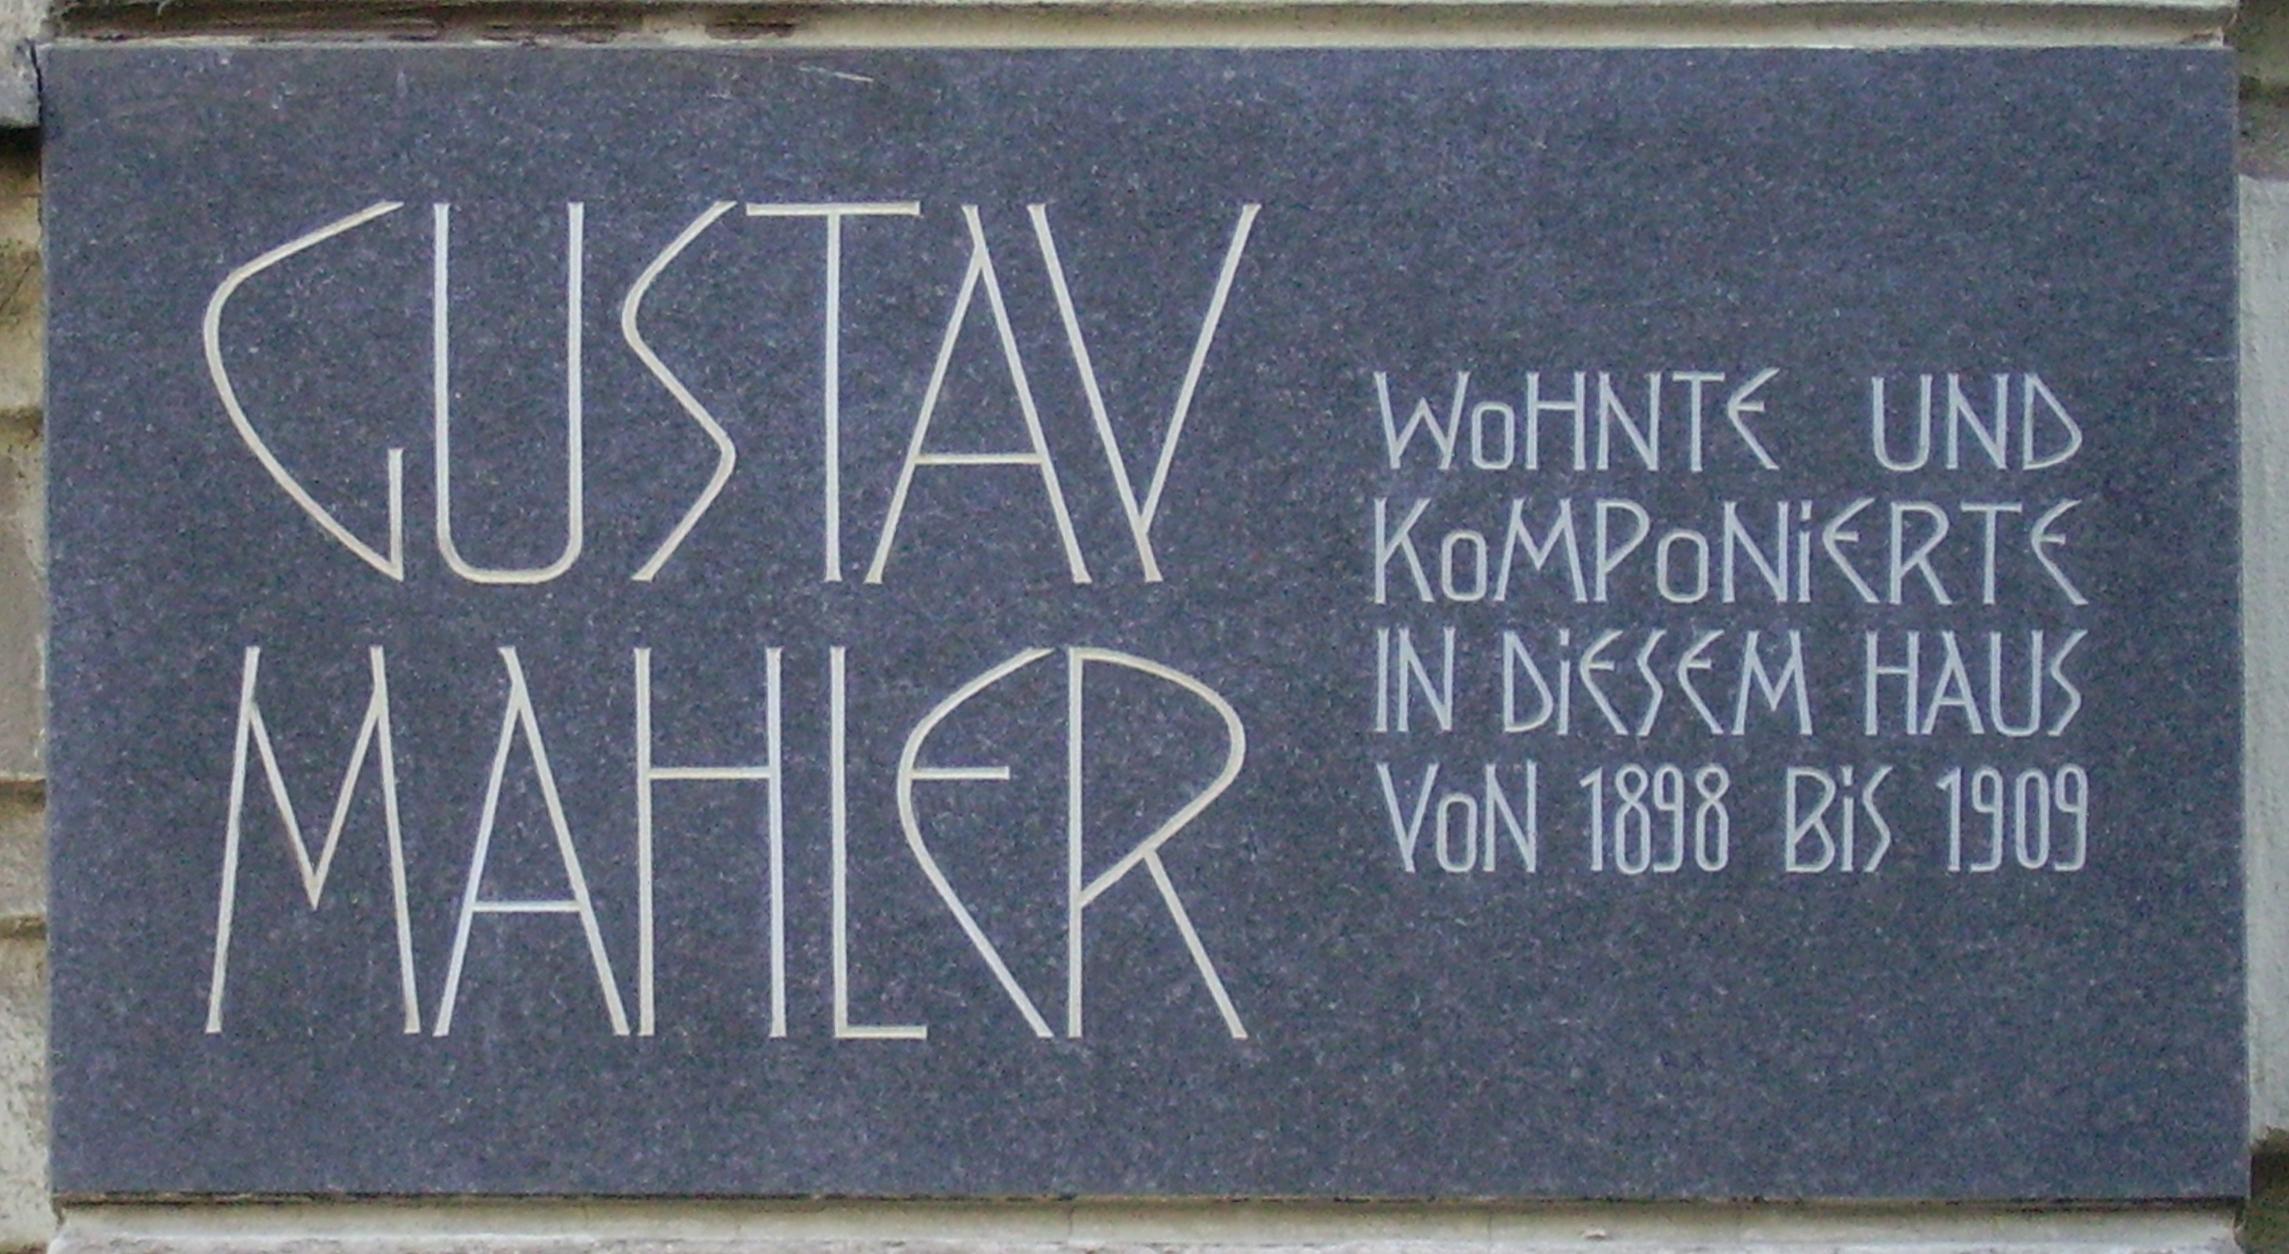 Mahler-Auenbruggergasse-2.jpg